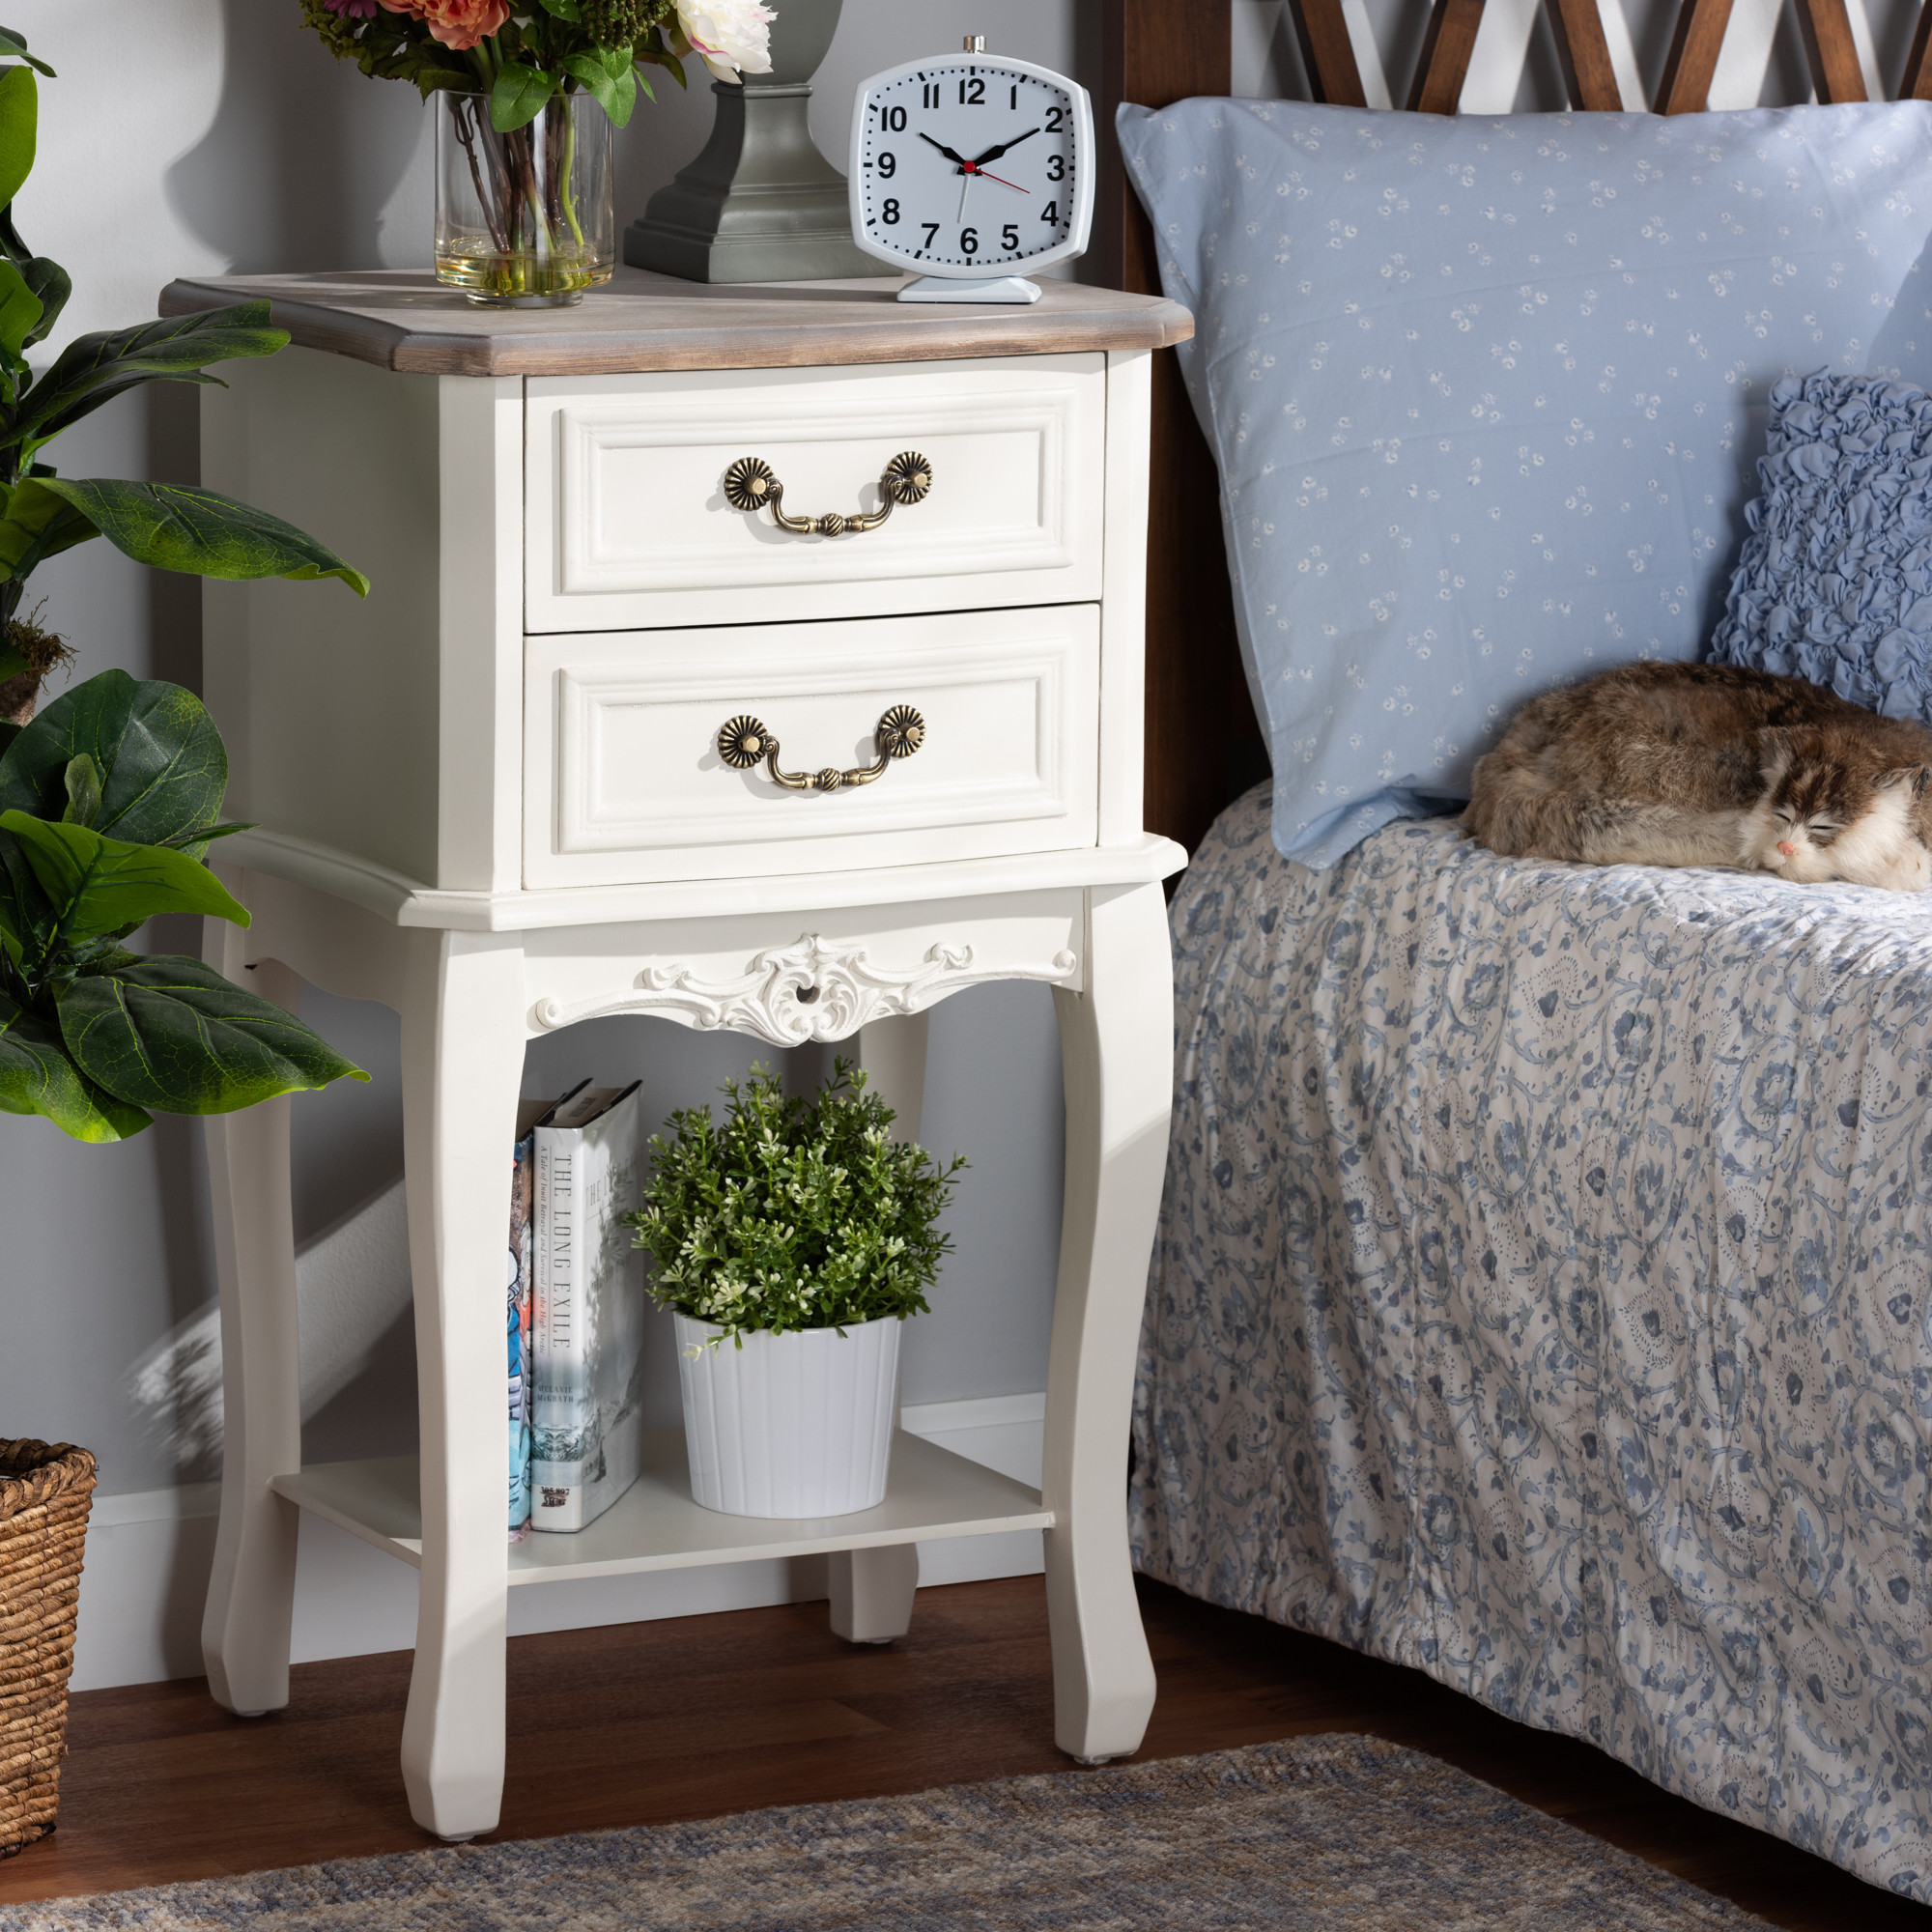 Wow Designer Studio Bedroom Furniture Enhance Your Sleep,Signs Like Live Laugh Love